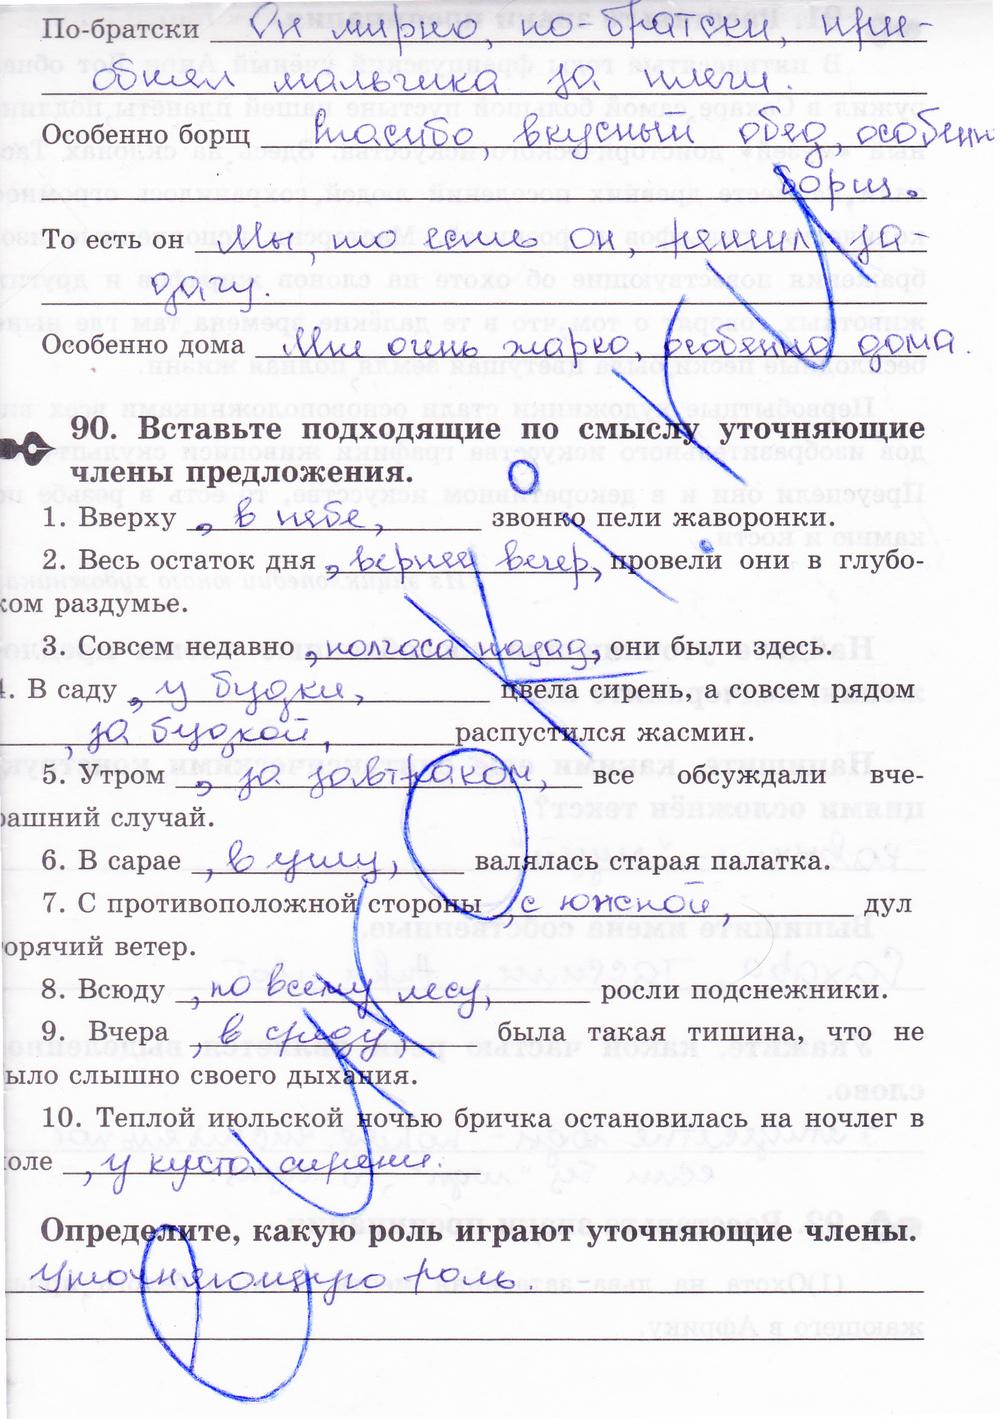 Гдз по русскому языку 5 класс практикум